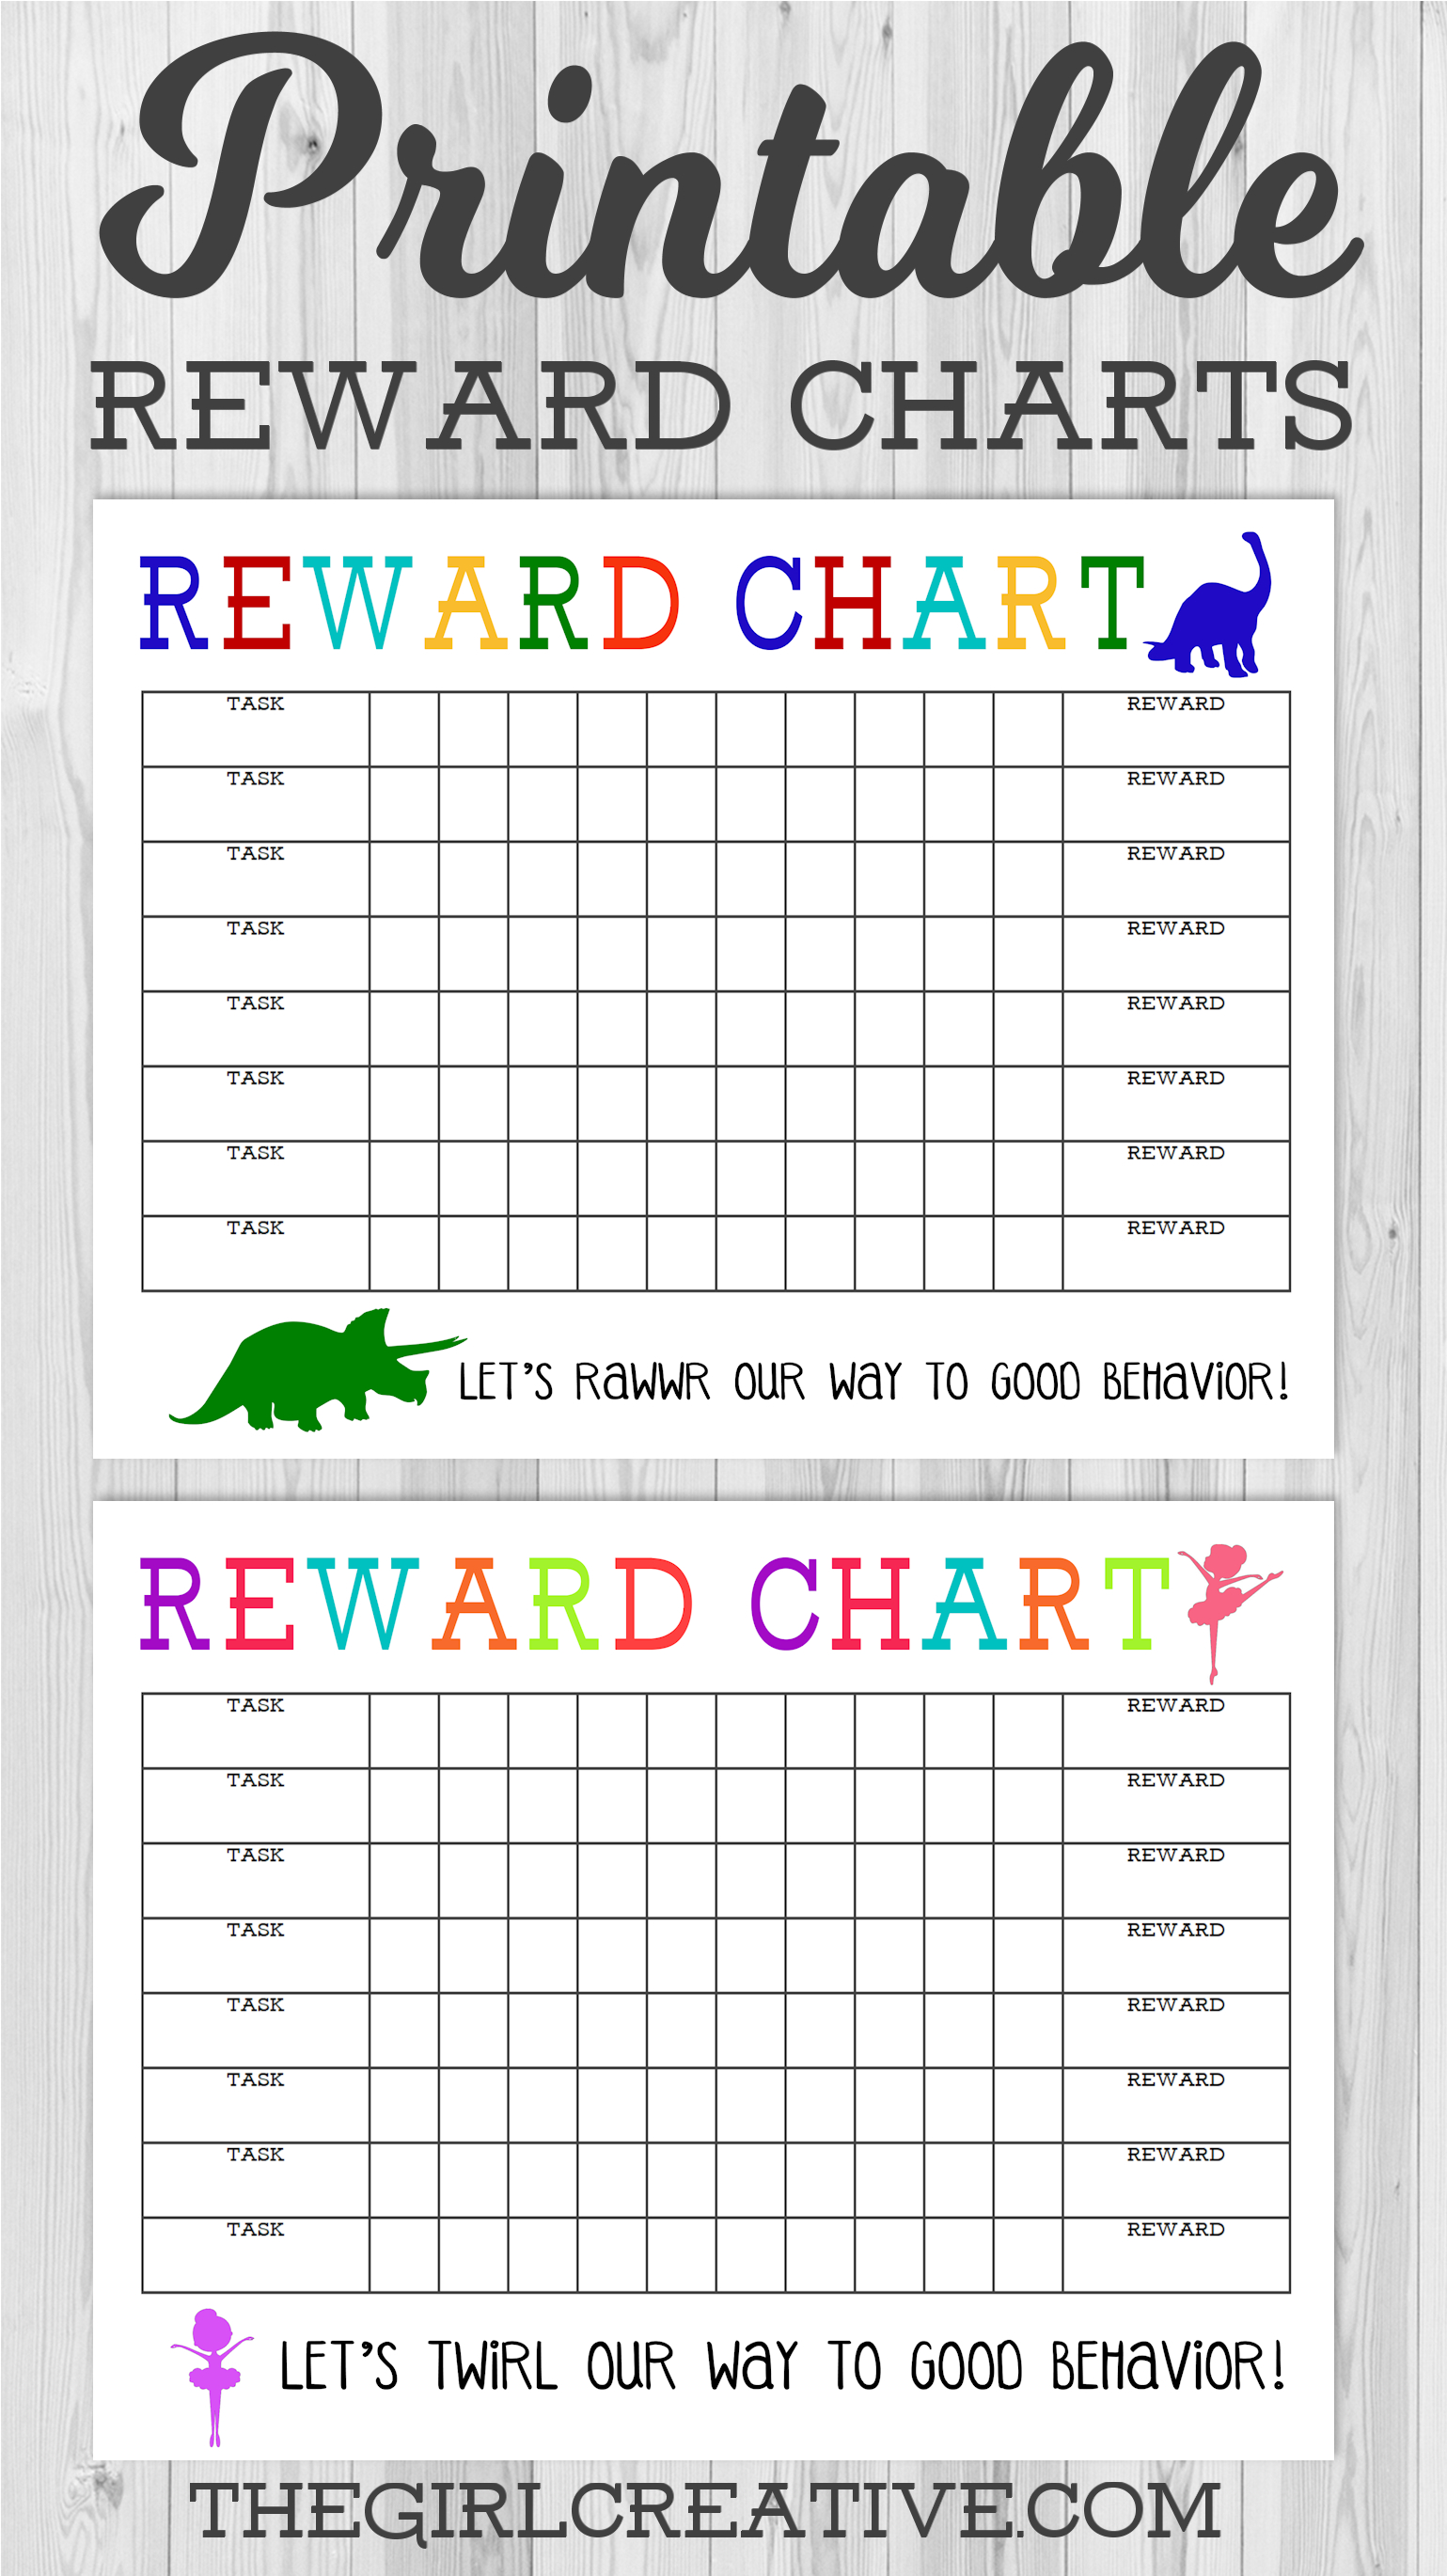 Printable Reward Chart - The Girl Creative - Free Printable Behaviour Charts For Home